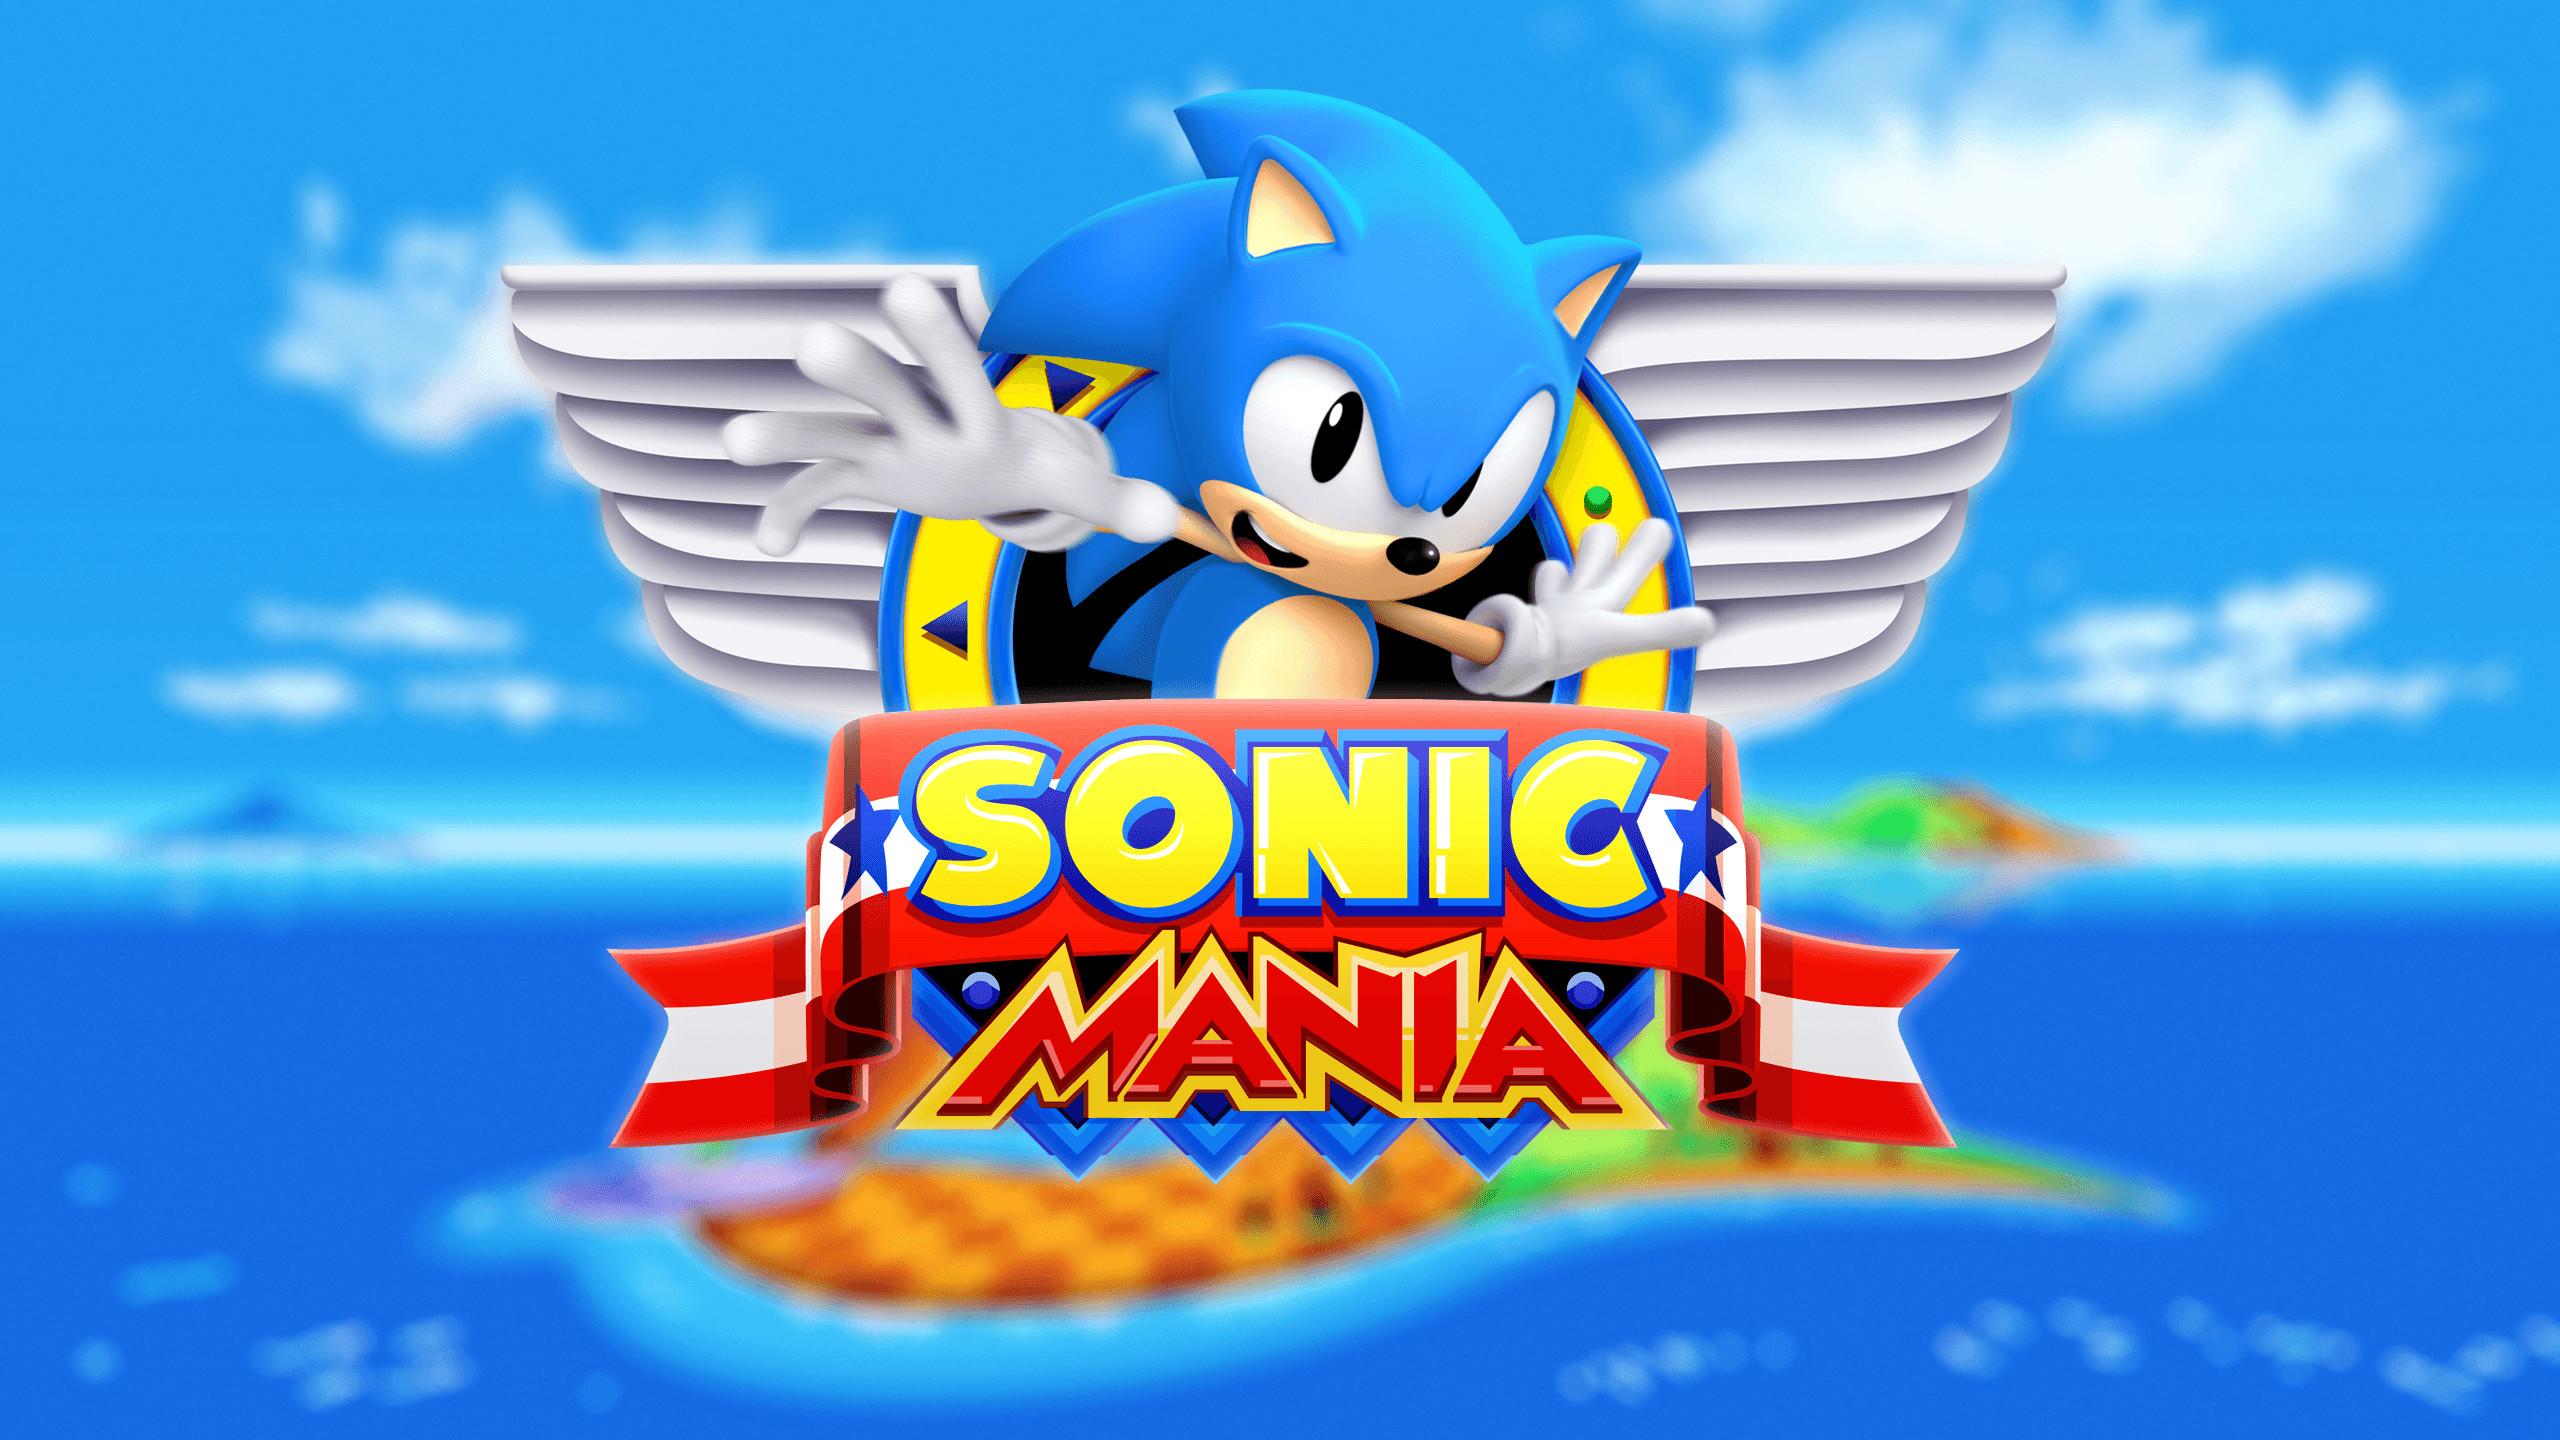 Sonic Mania HD by gameplayuk on DeviantArt